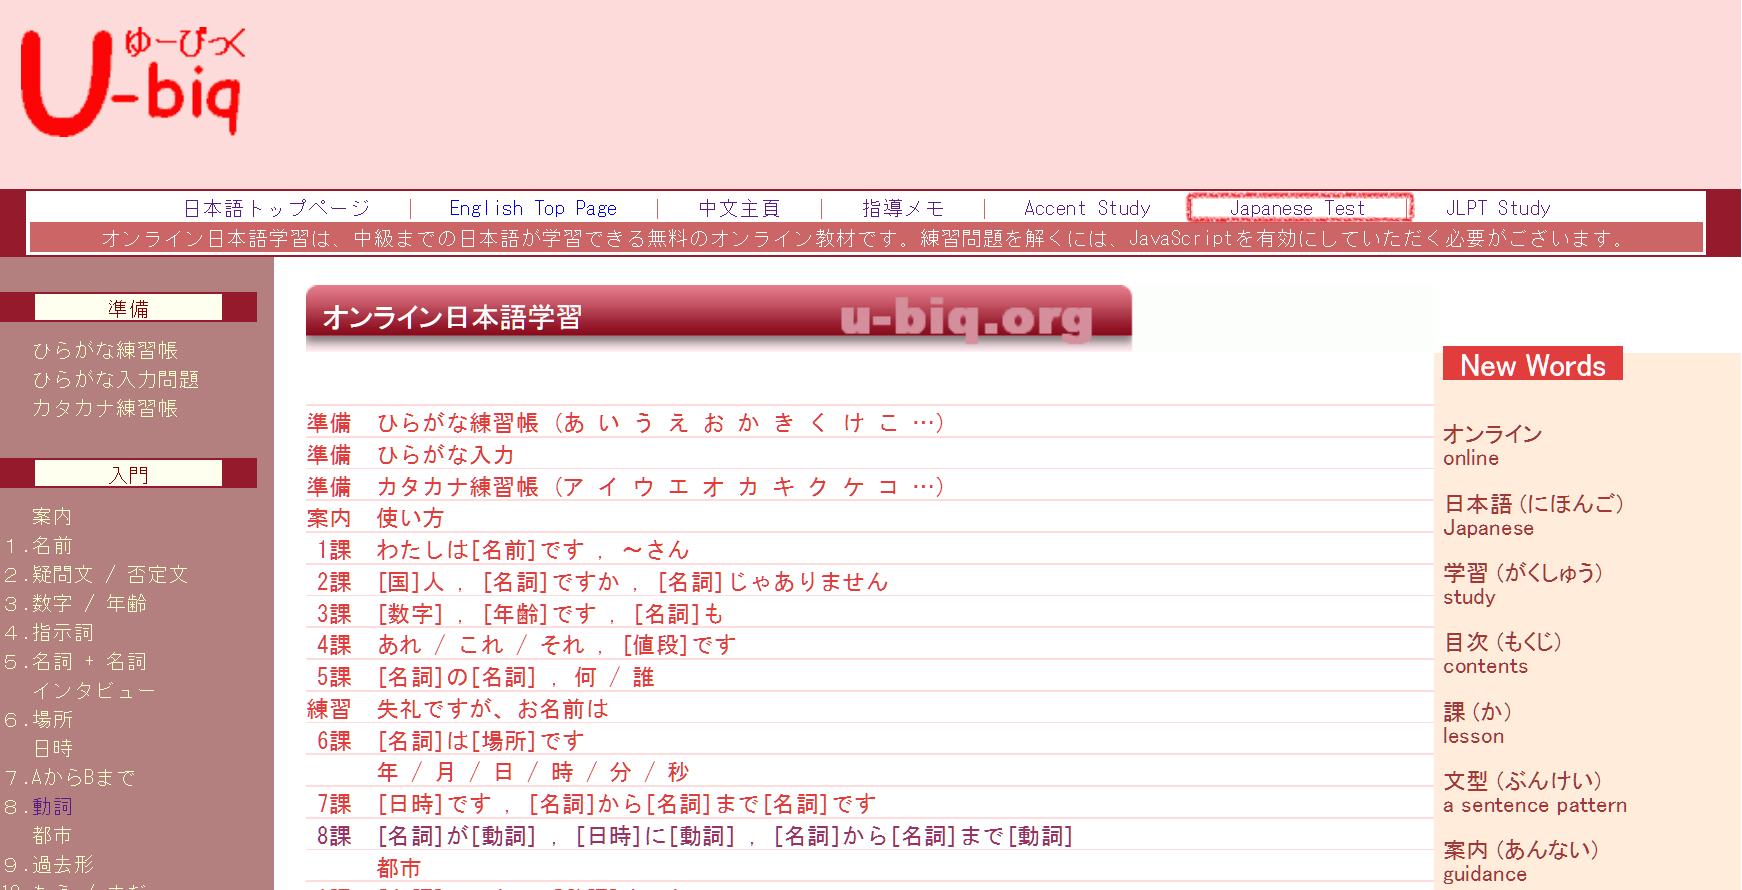 u-biq homepage